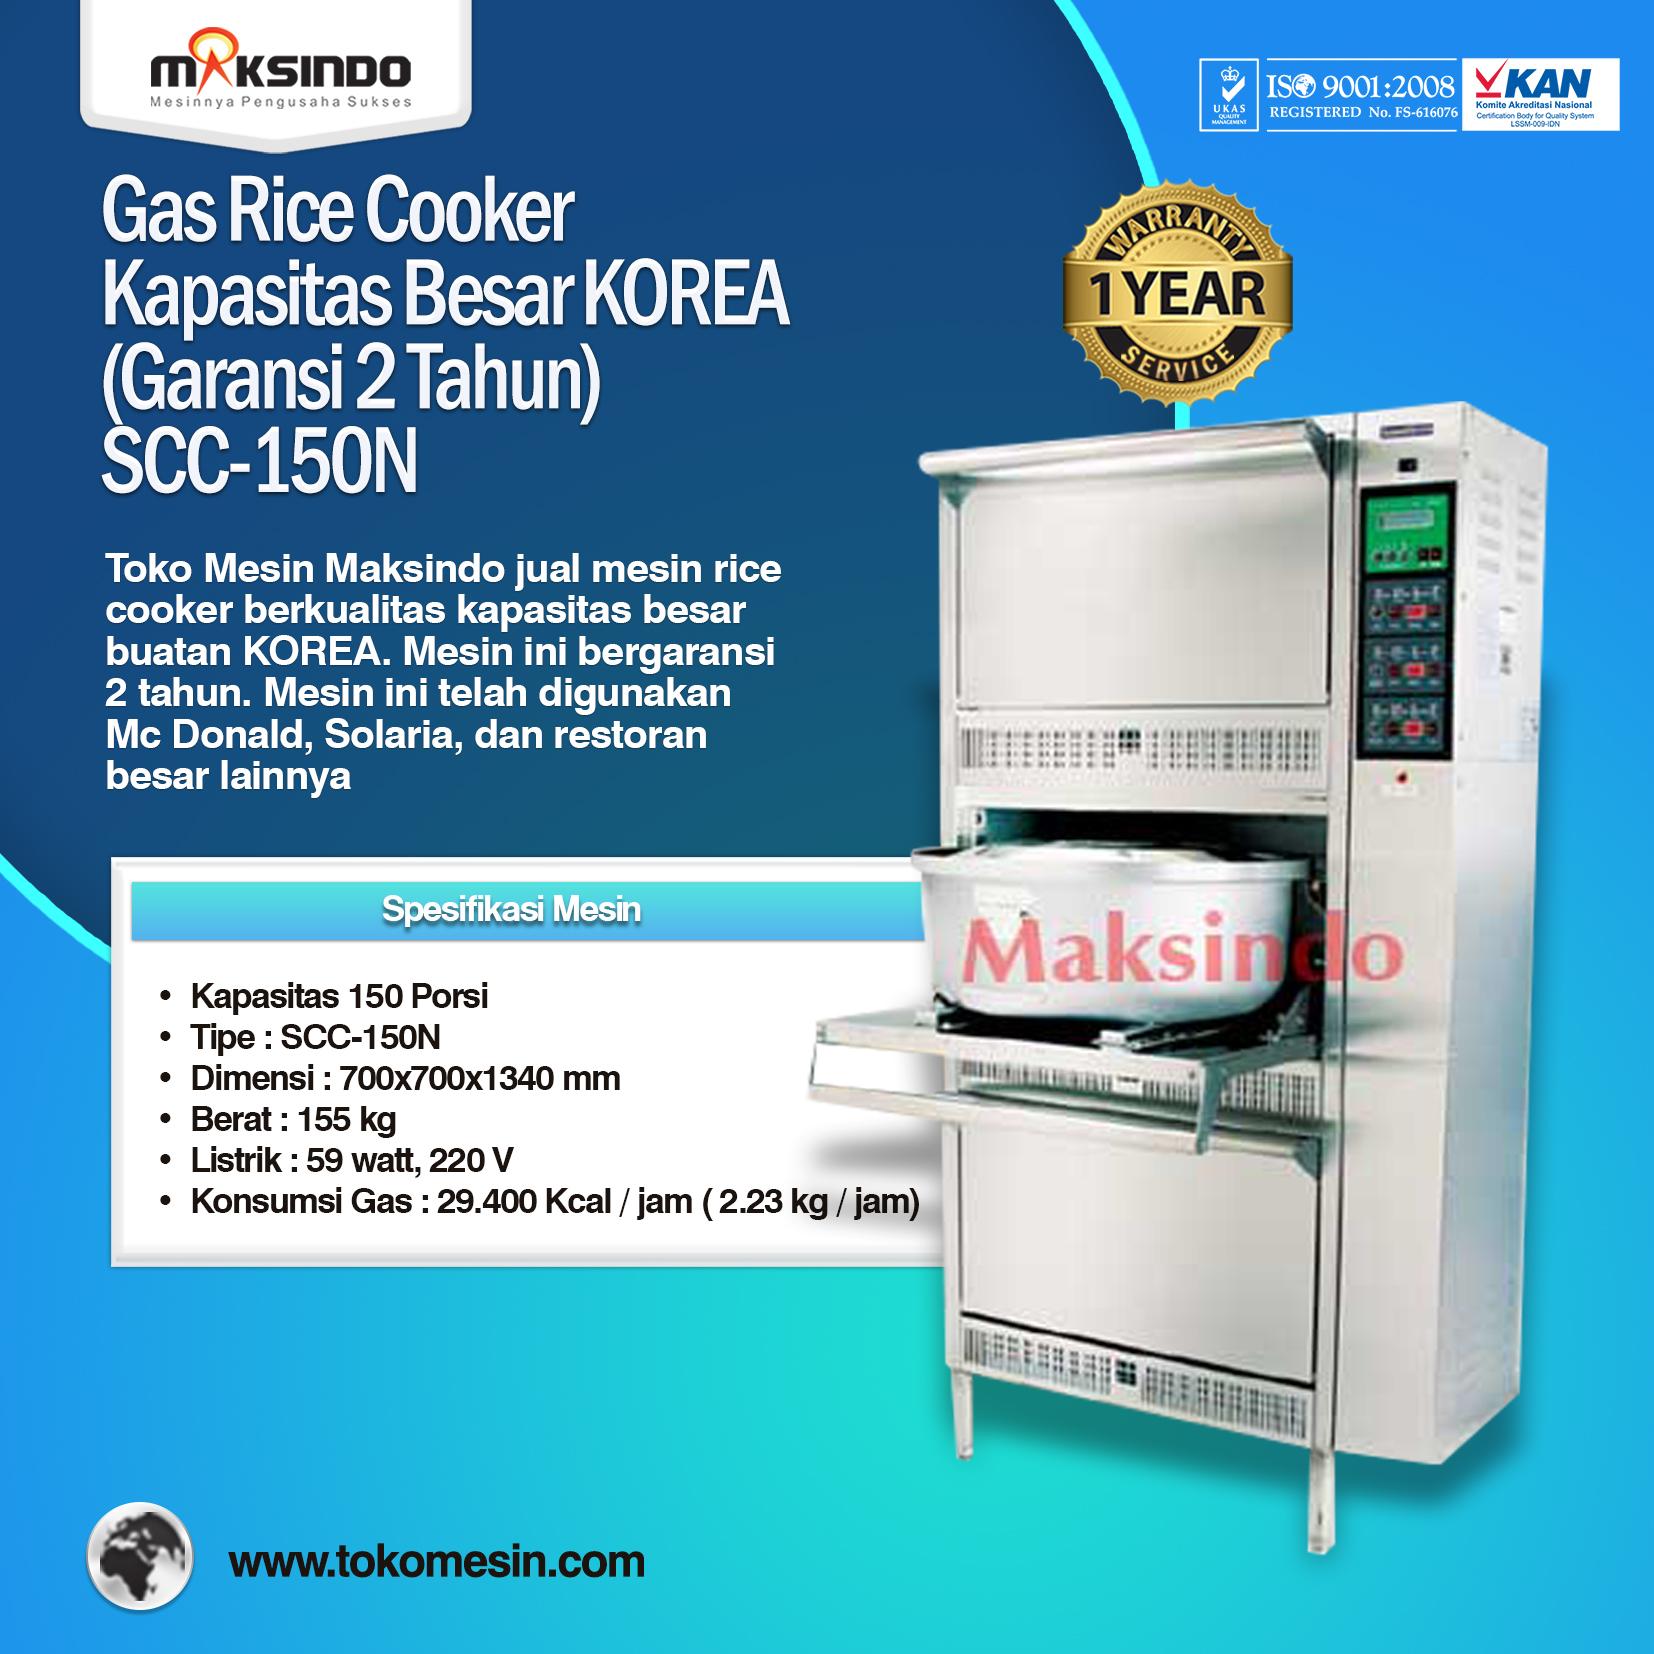 Gas Rice Cooker Kapasitas Besar KOREA SCC-150N